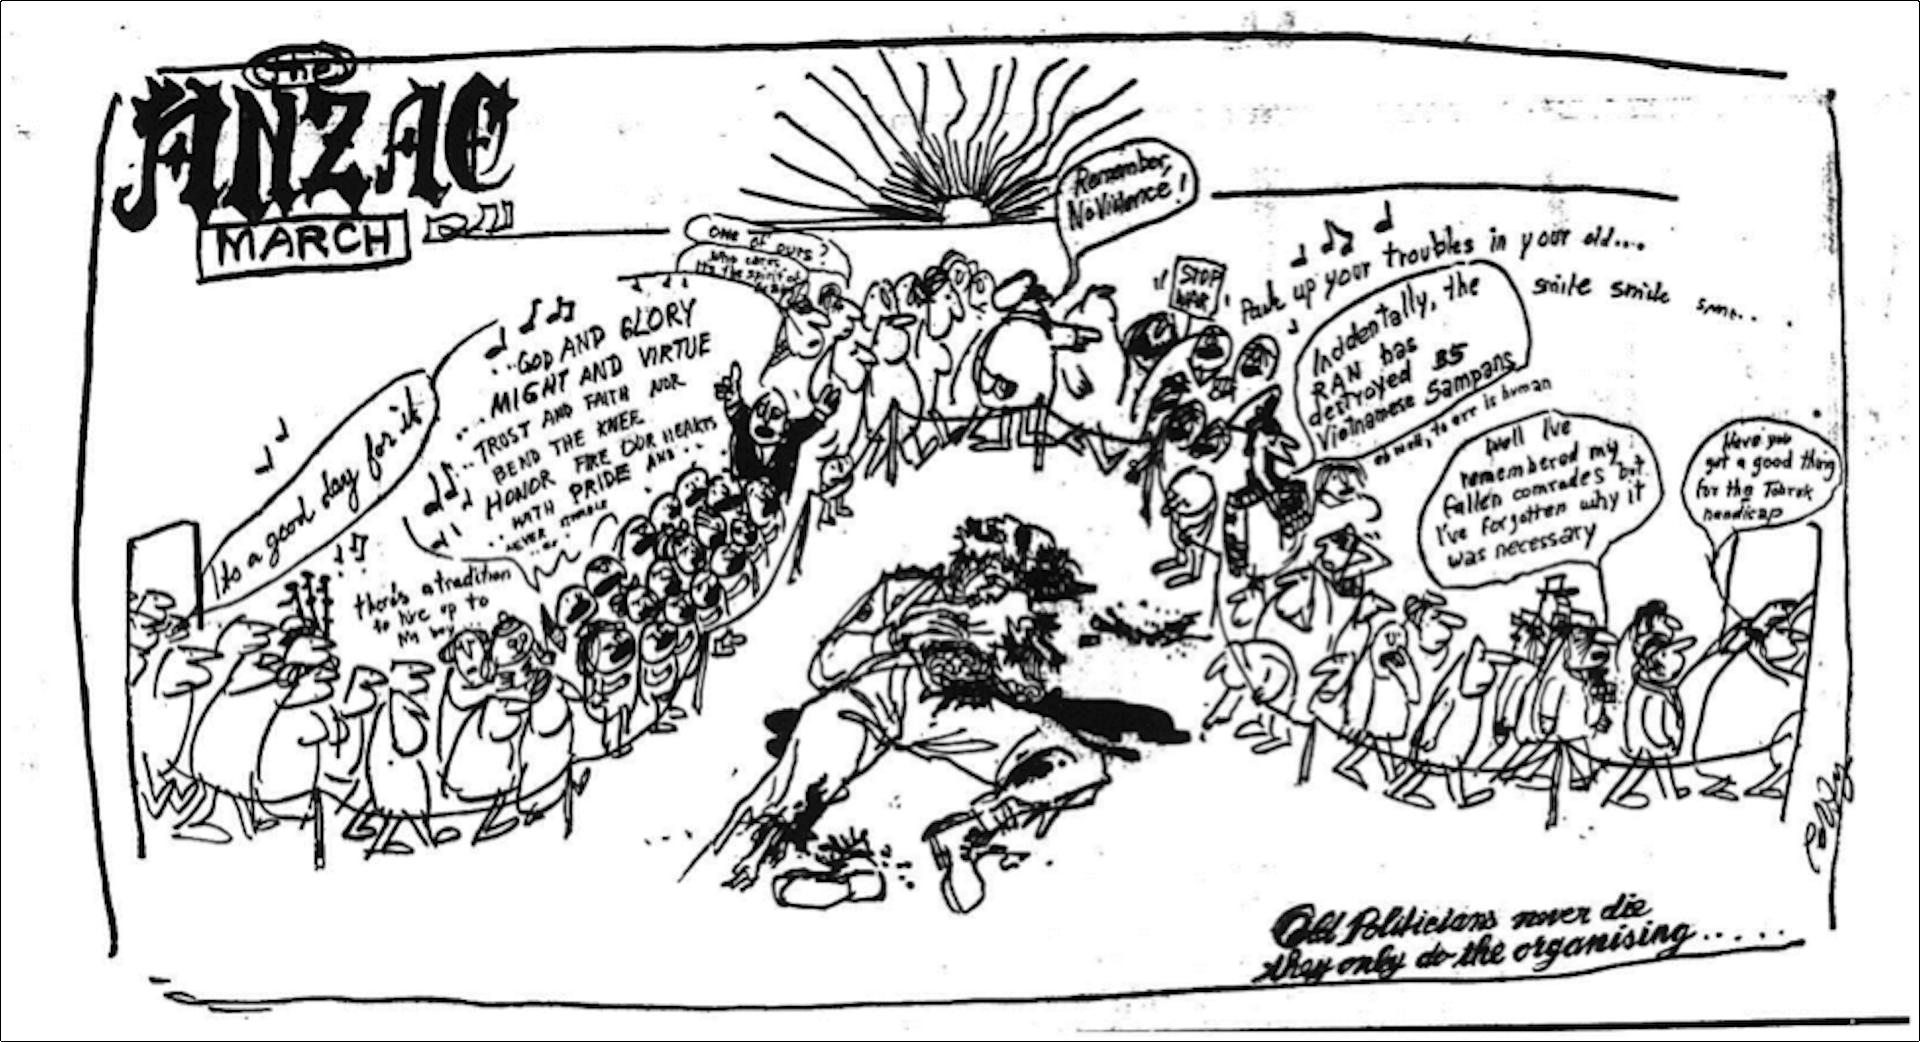 The Australian Helped Political Cartoonists Sharpen Their Edge